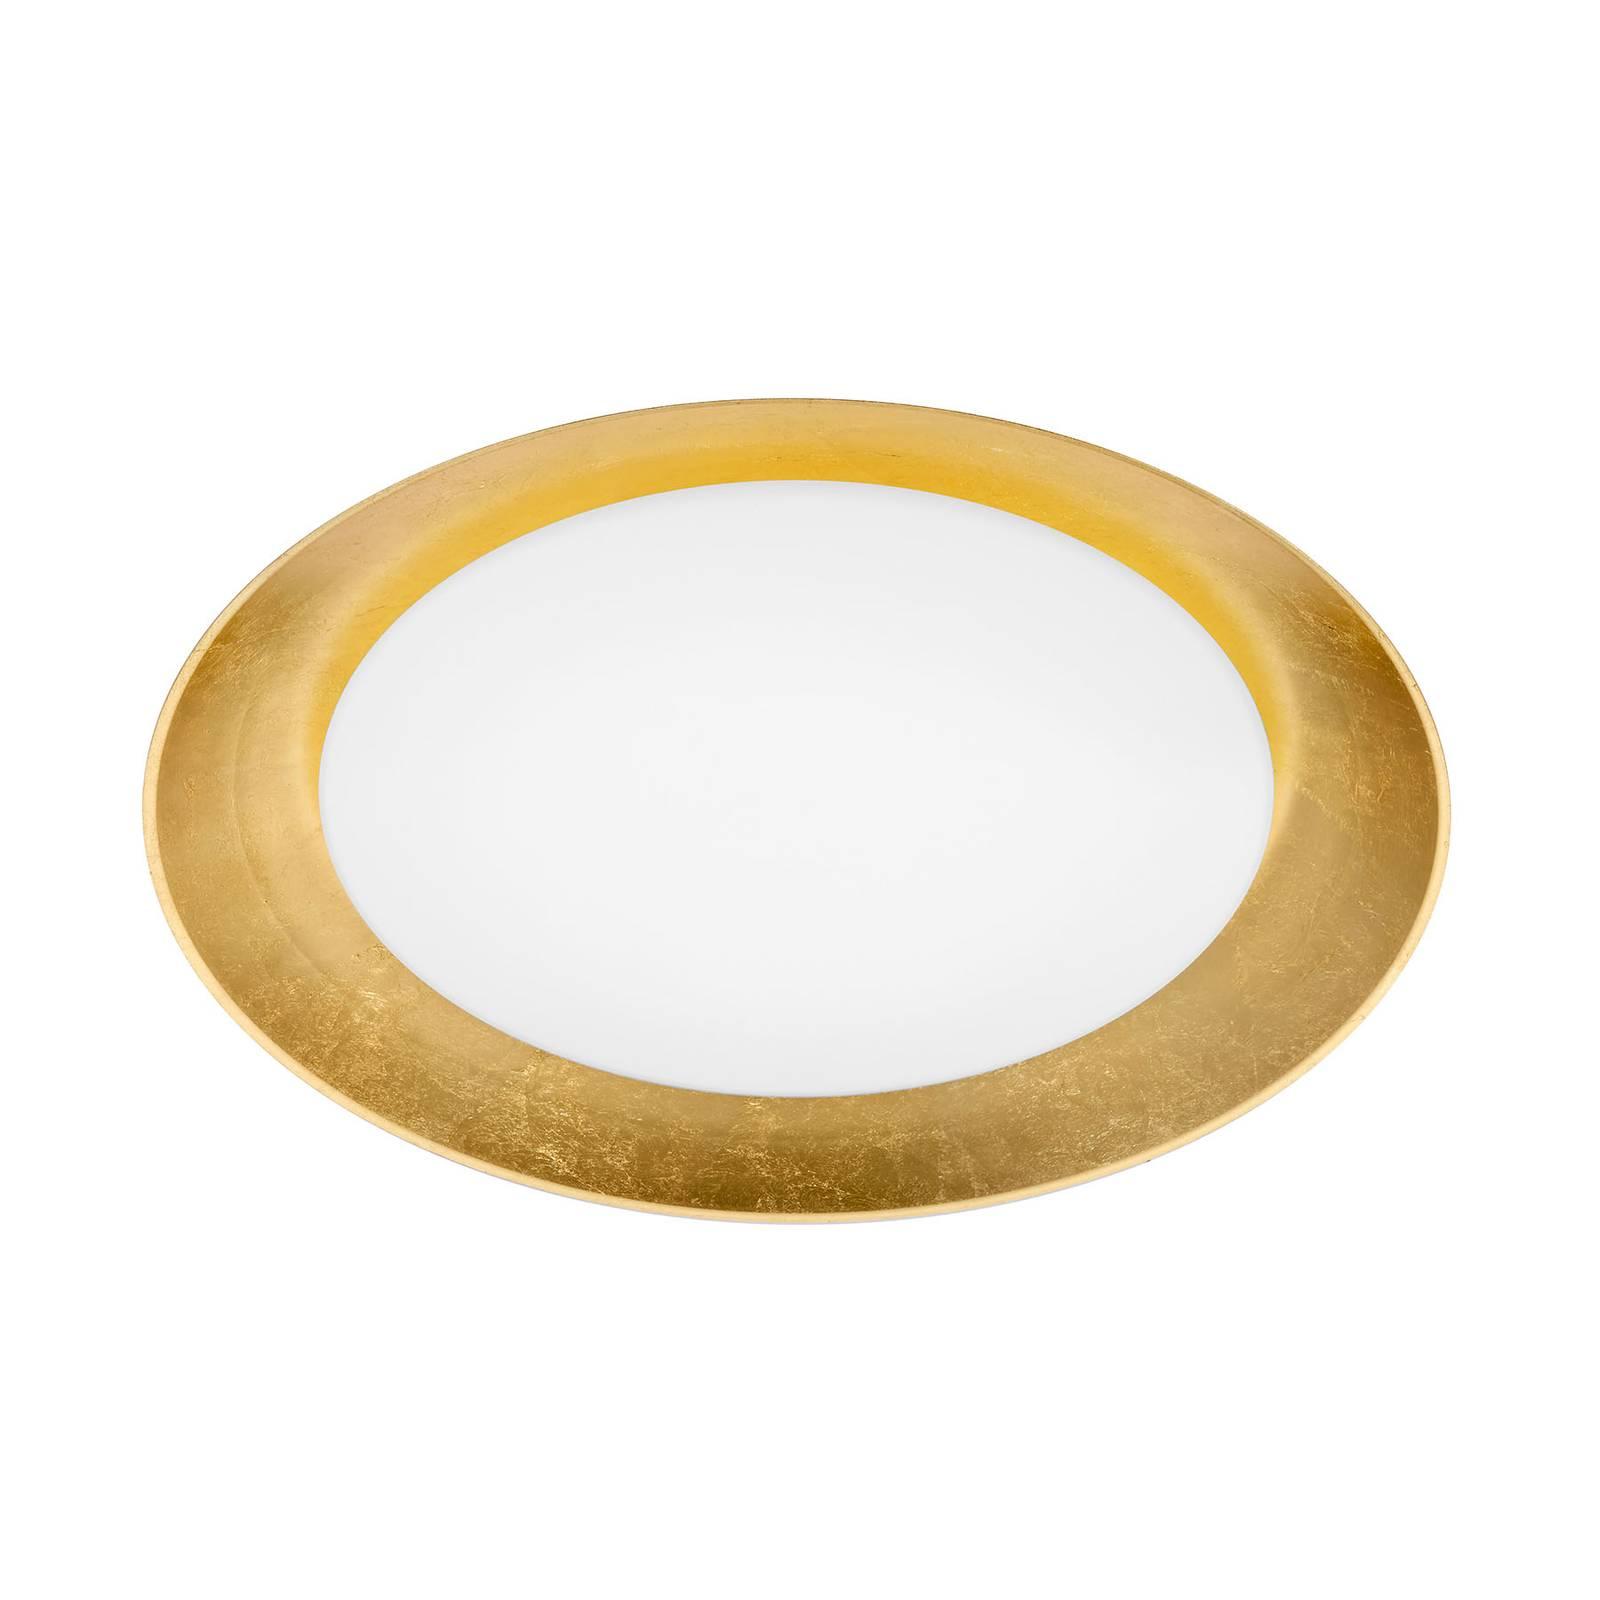 BANKAMP Cover LED-Deckenleuchte Ø54cm blattgold